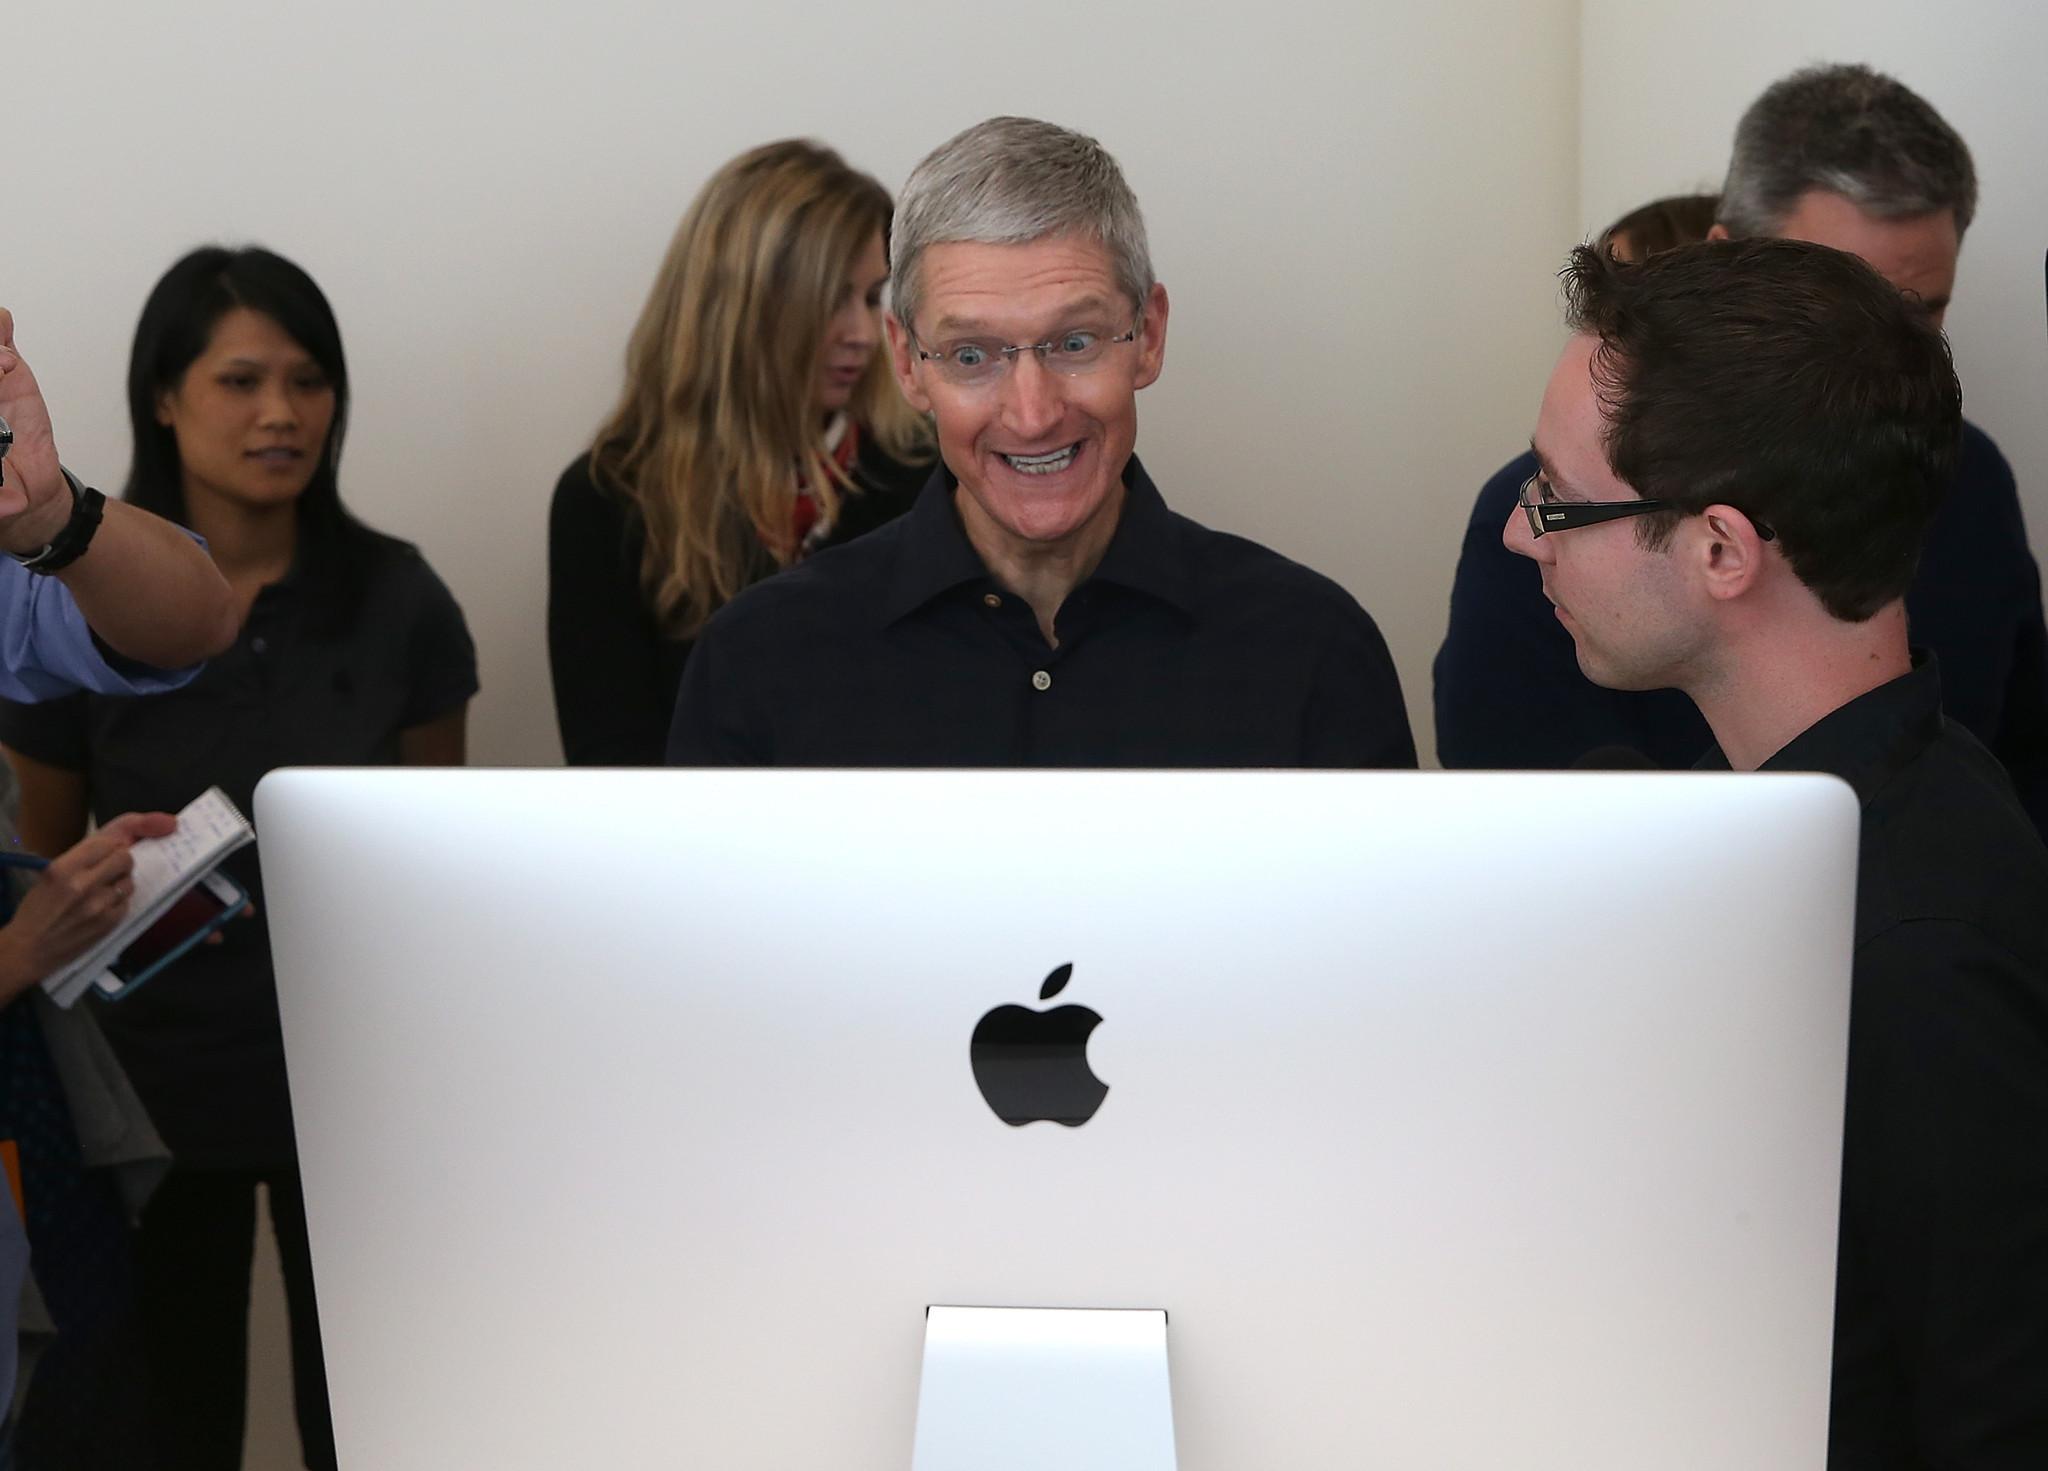 Apple has huge fourth quarter, reports profit up 13% to $8.5 billion